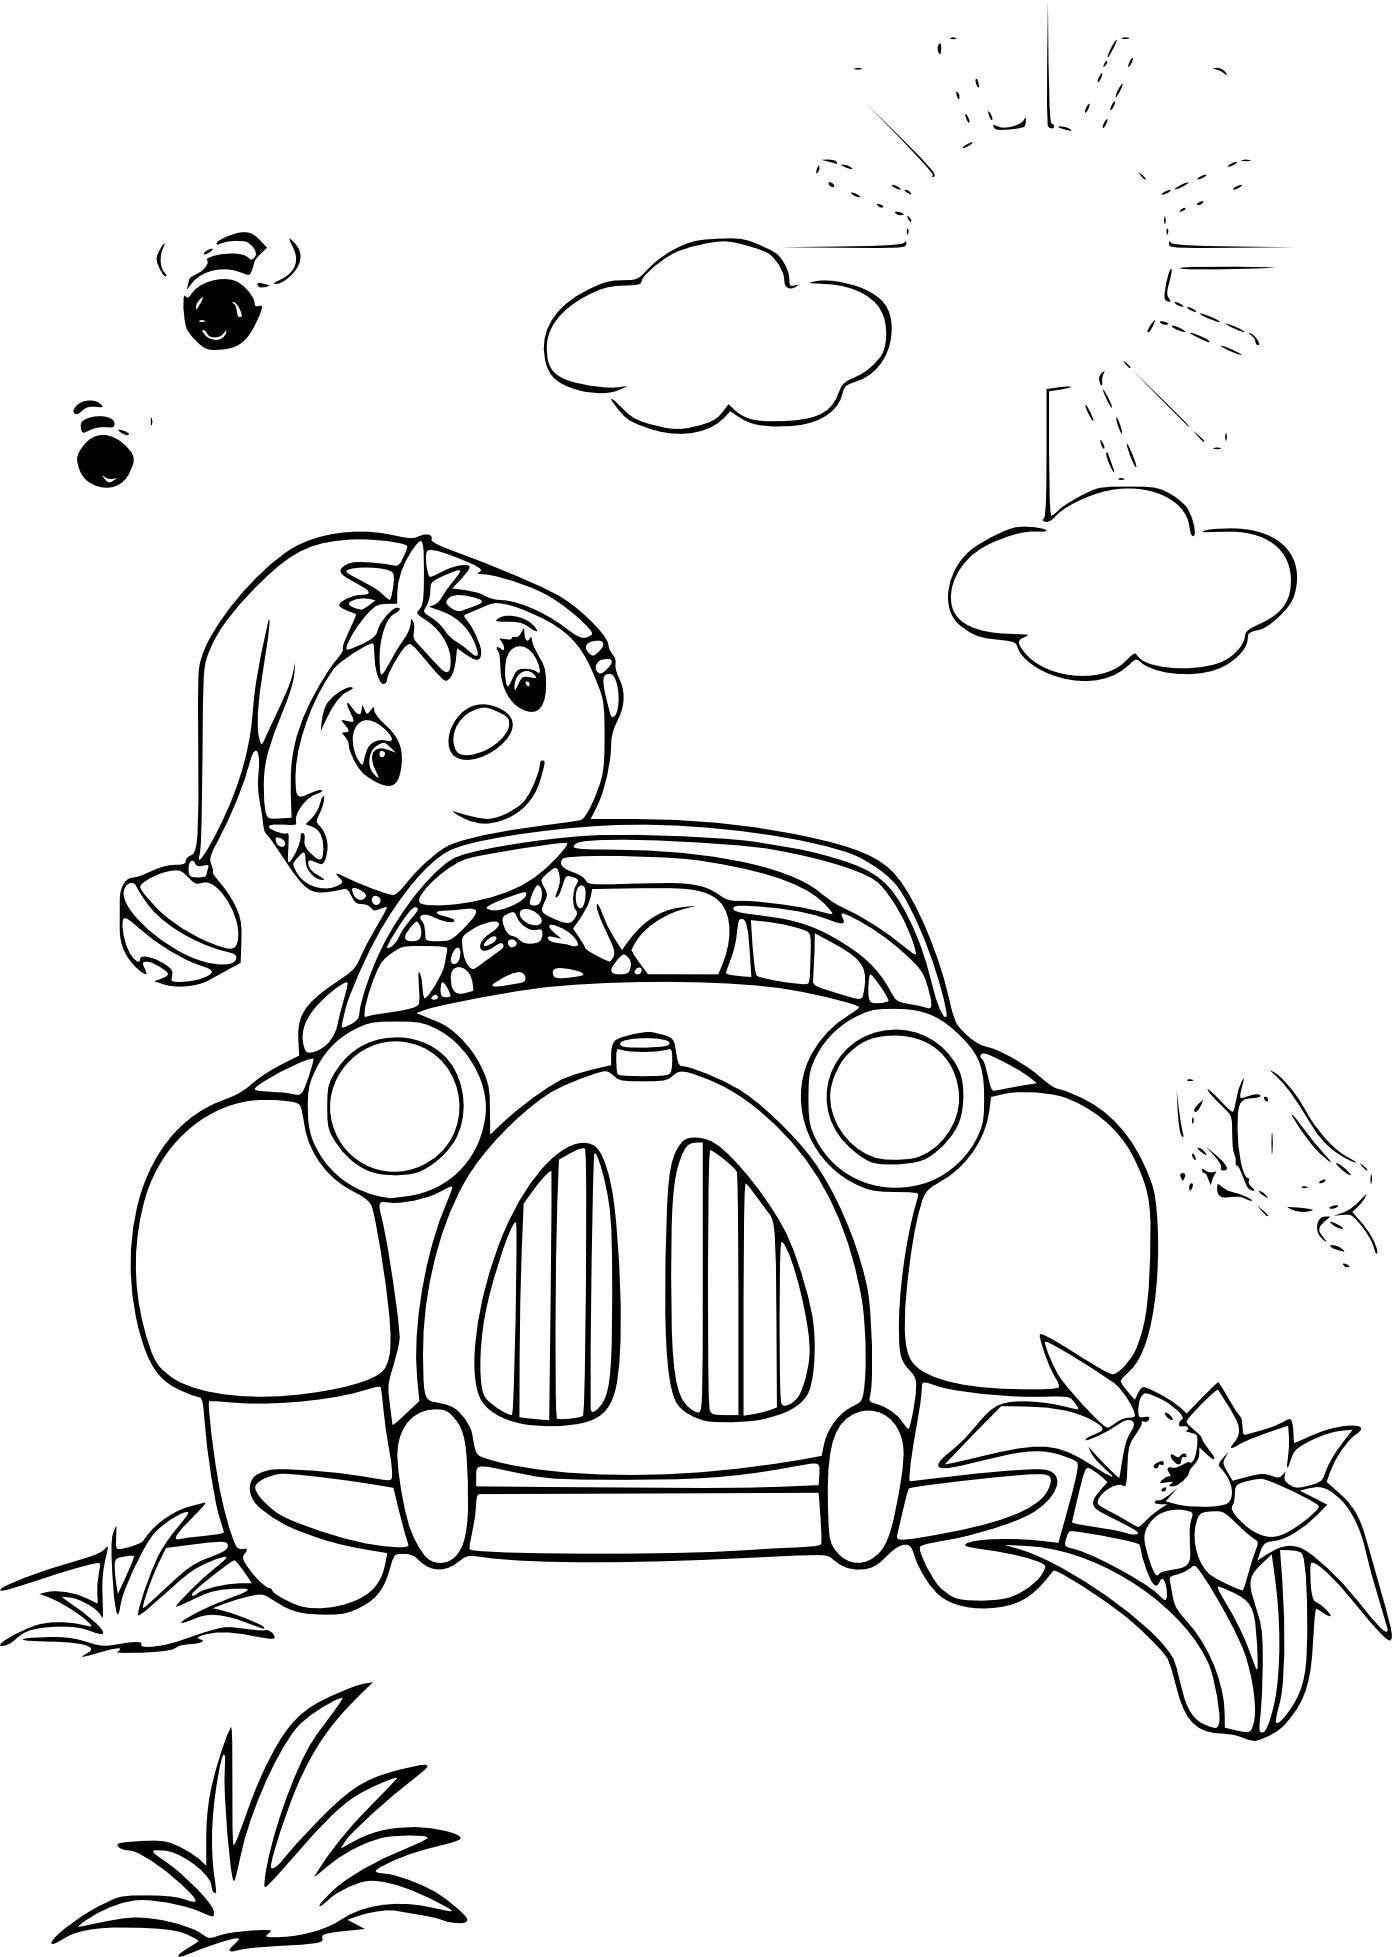 Coloriage voiture oui oui imprimer - Le dessin anime oui oui ...